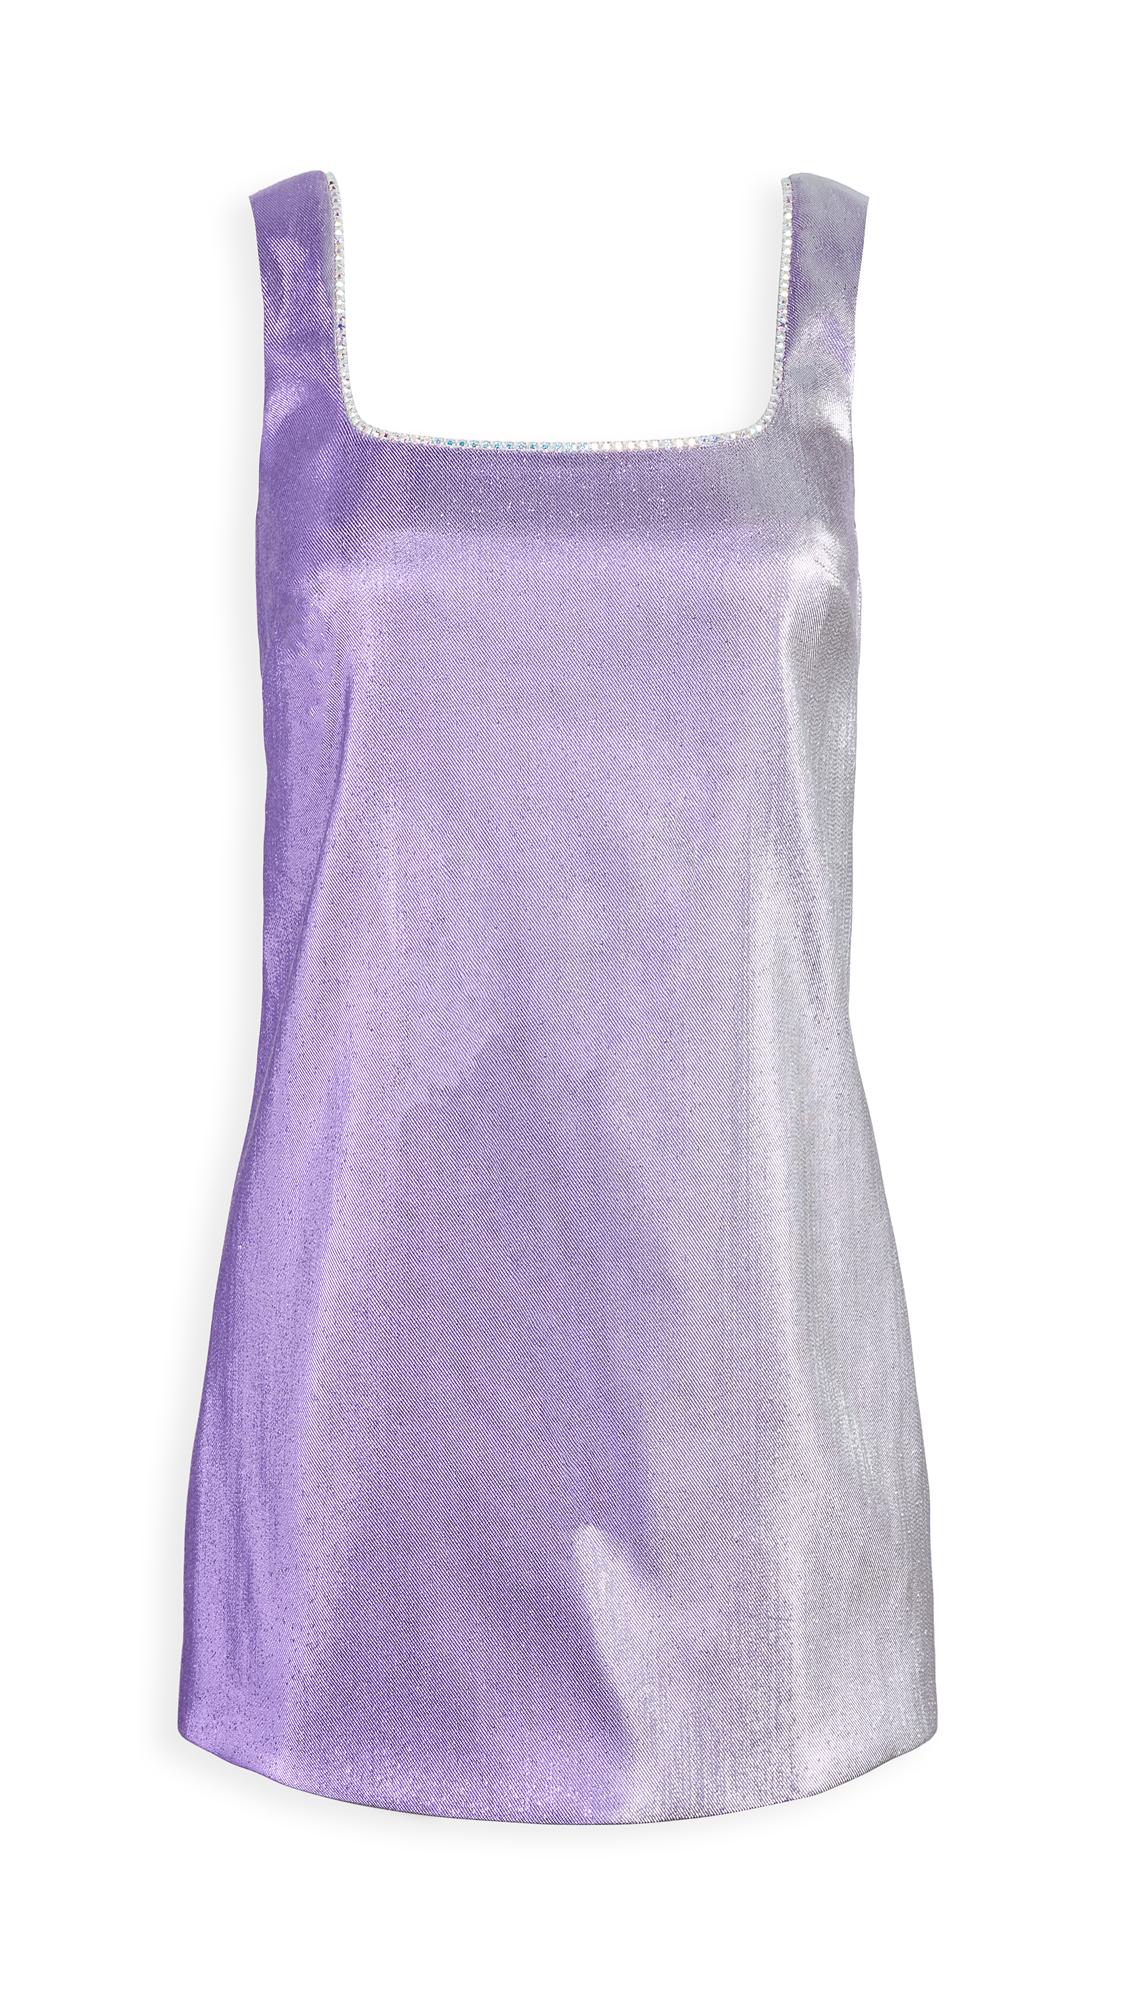 Area Crystal Choker Mini Dress - 50% Off Sale